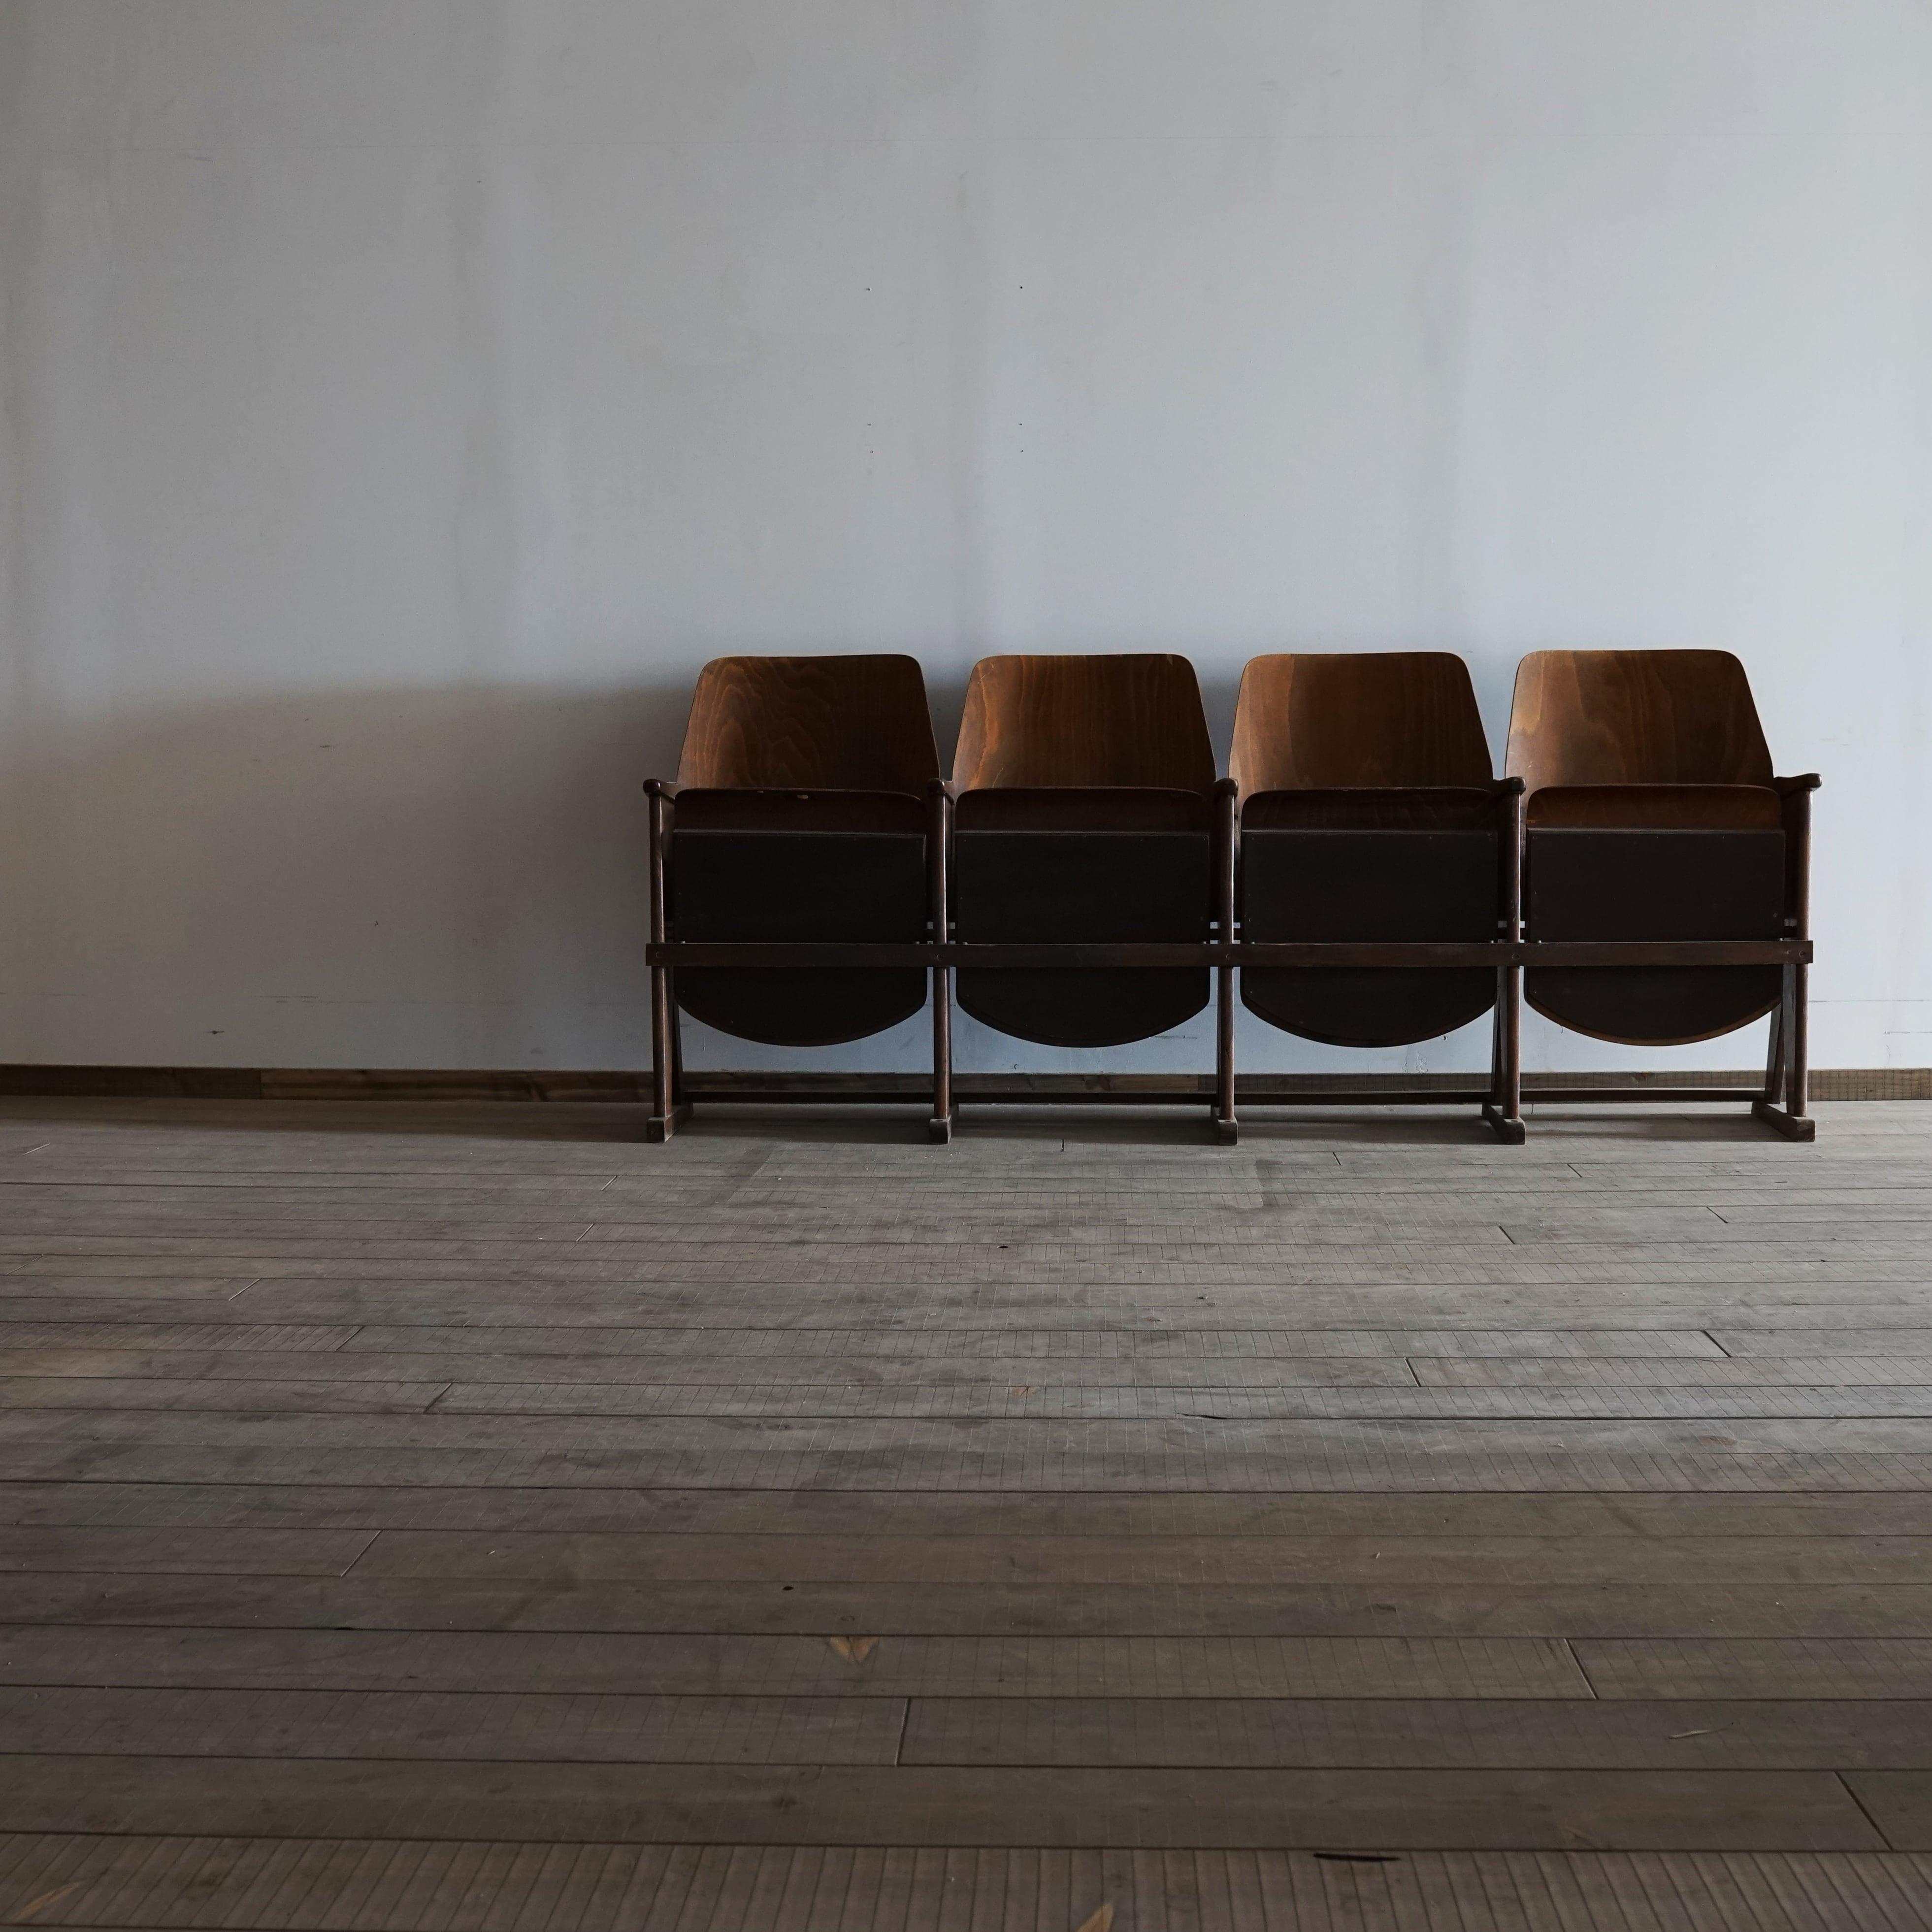 #02-01 old cinema chair